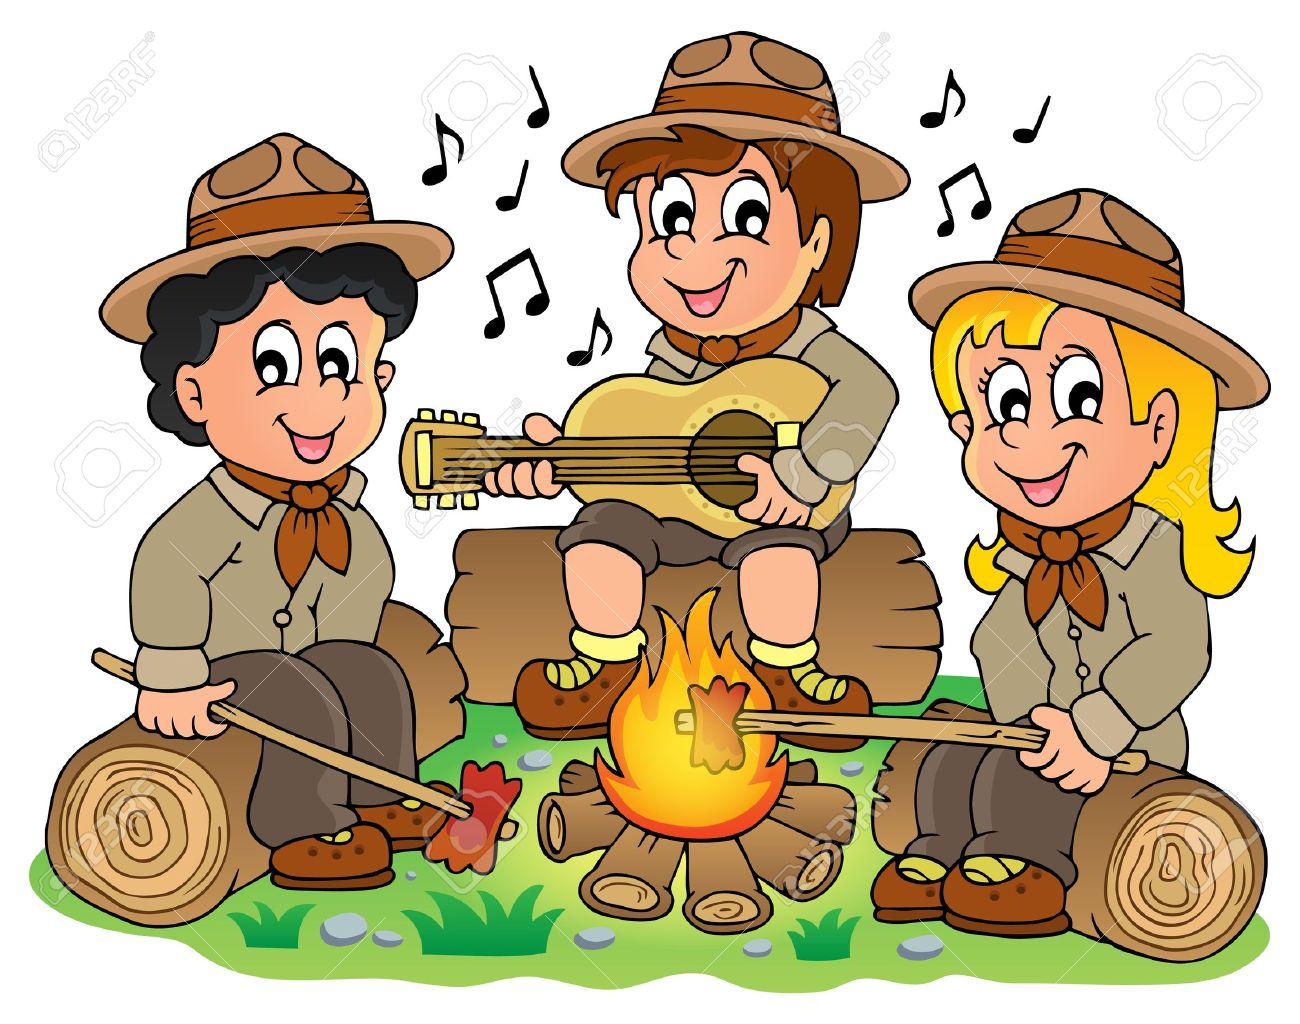 Children scouts theme image 1 - eps10 vector illustration Stock Vector - 27507481